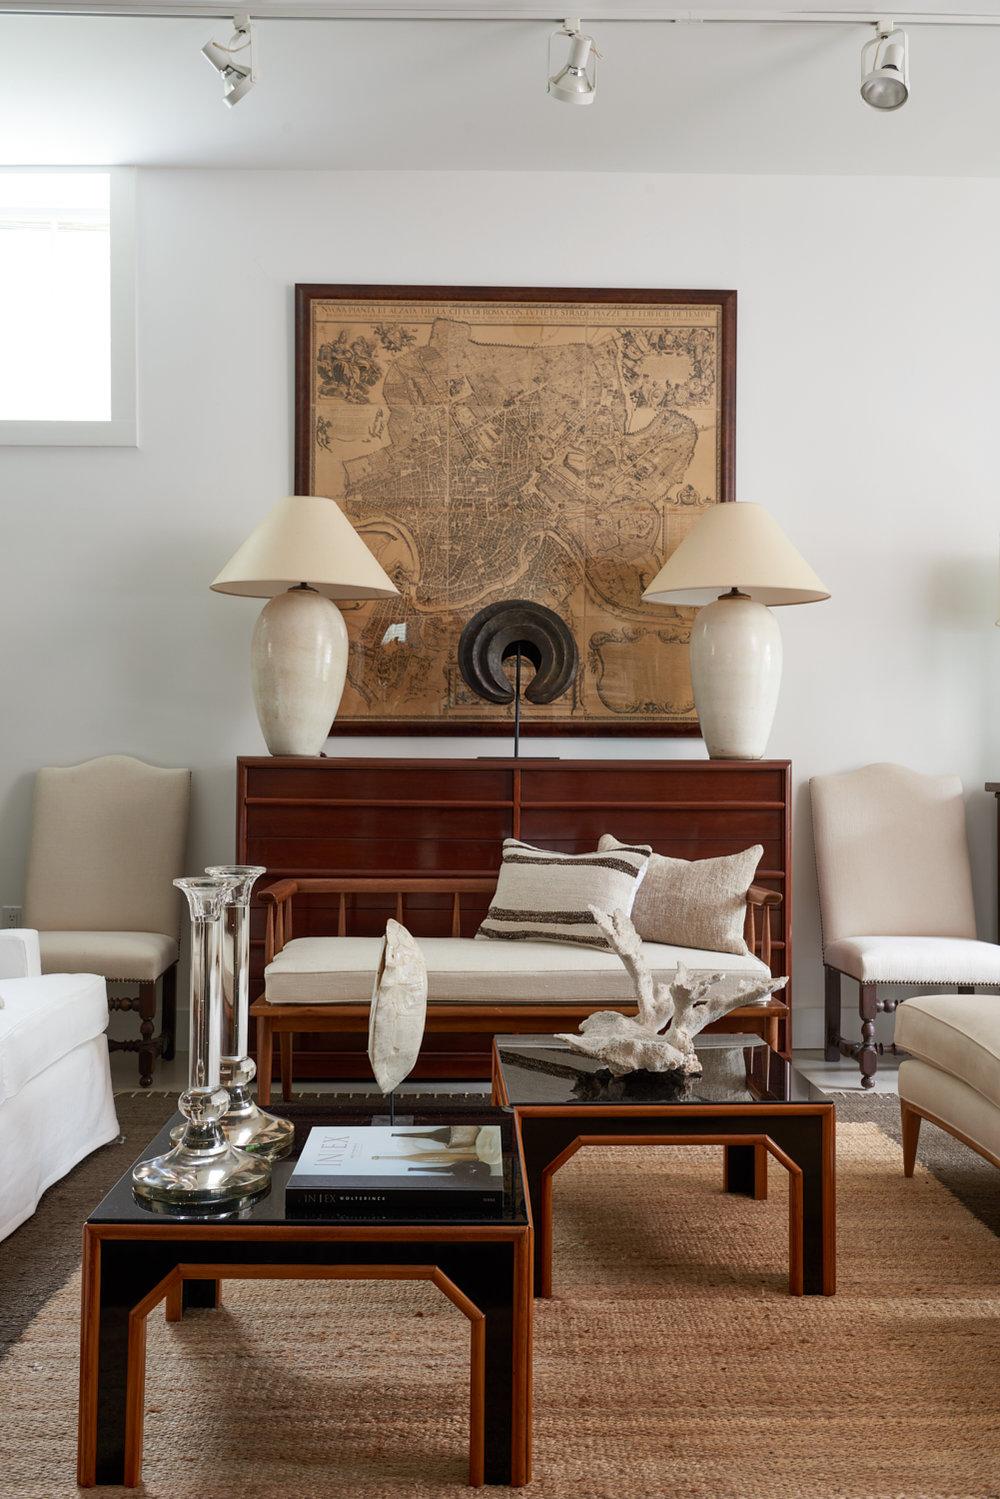 Dresser by TH Robsjohn-Gibbings c 1950, $5000, Pair ceramic Asian jar lamps, $2800